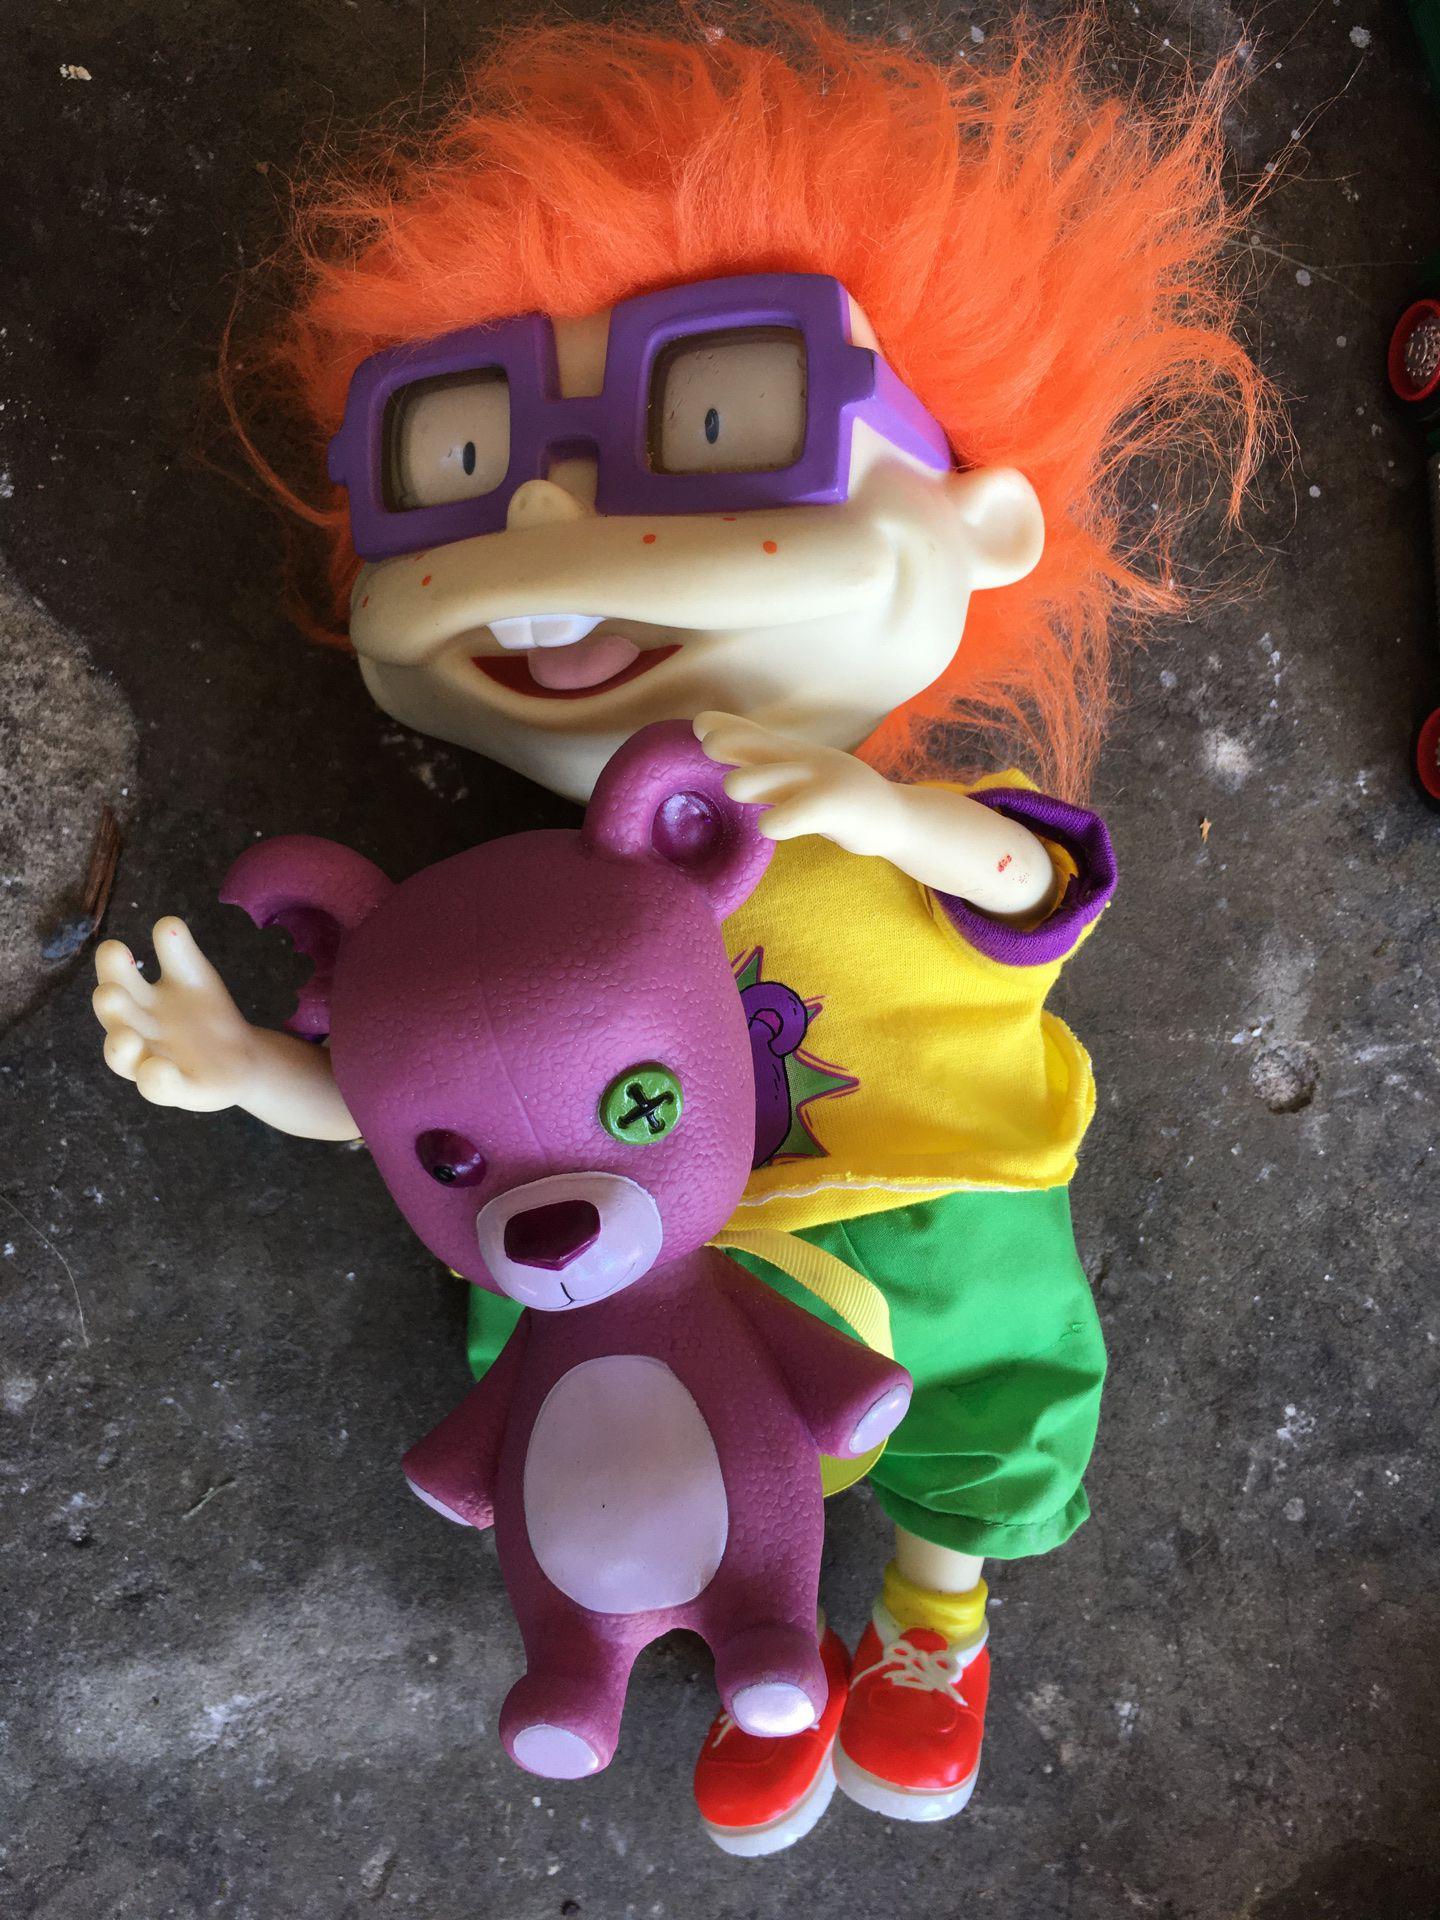 Rugrats doll